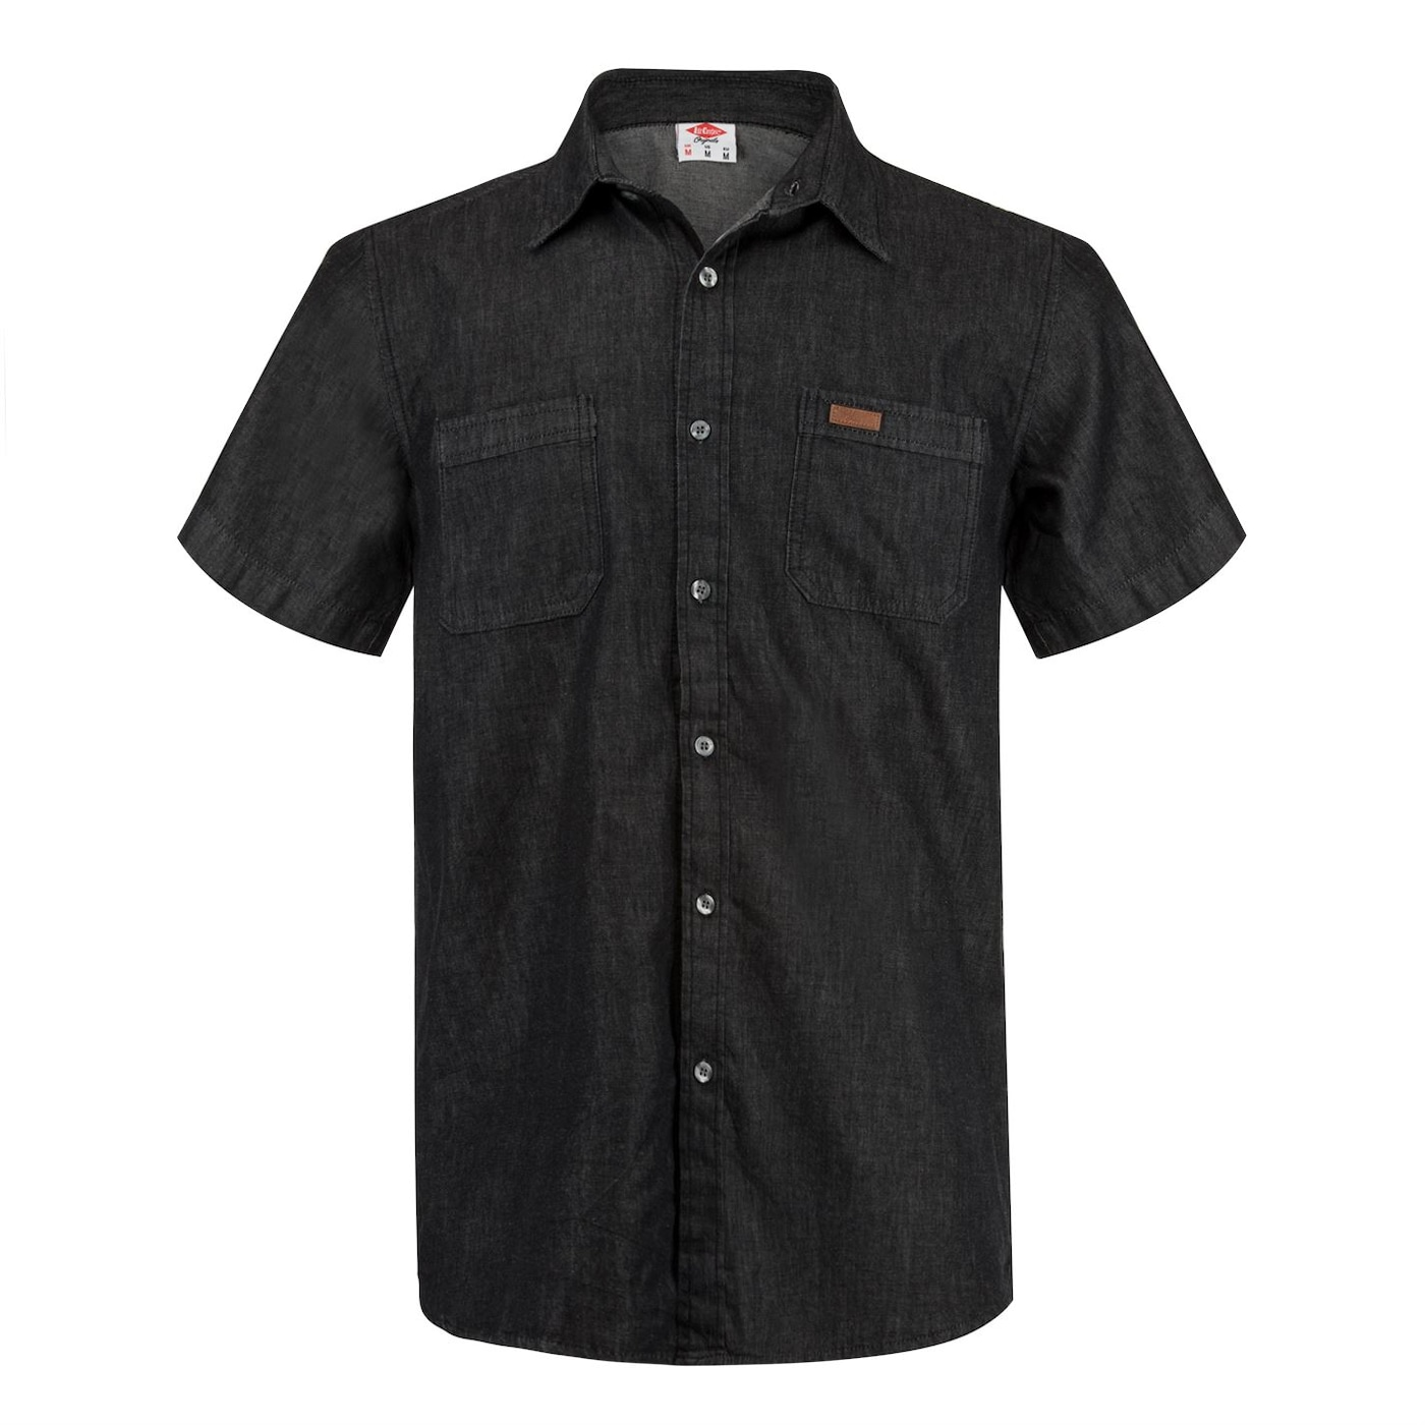 Lee Cooper Short Sleeve Denim Shirt Mens